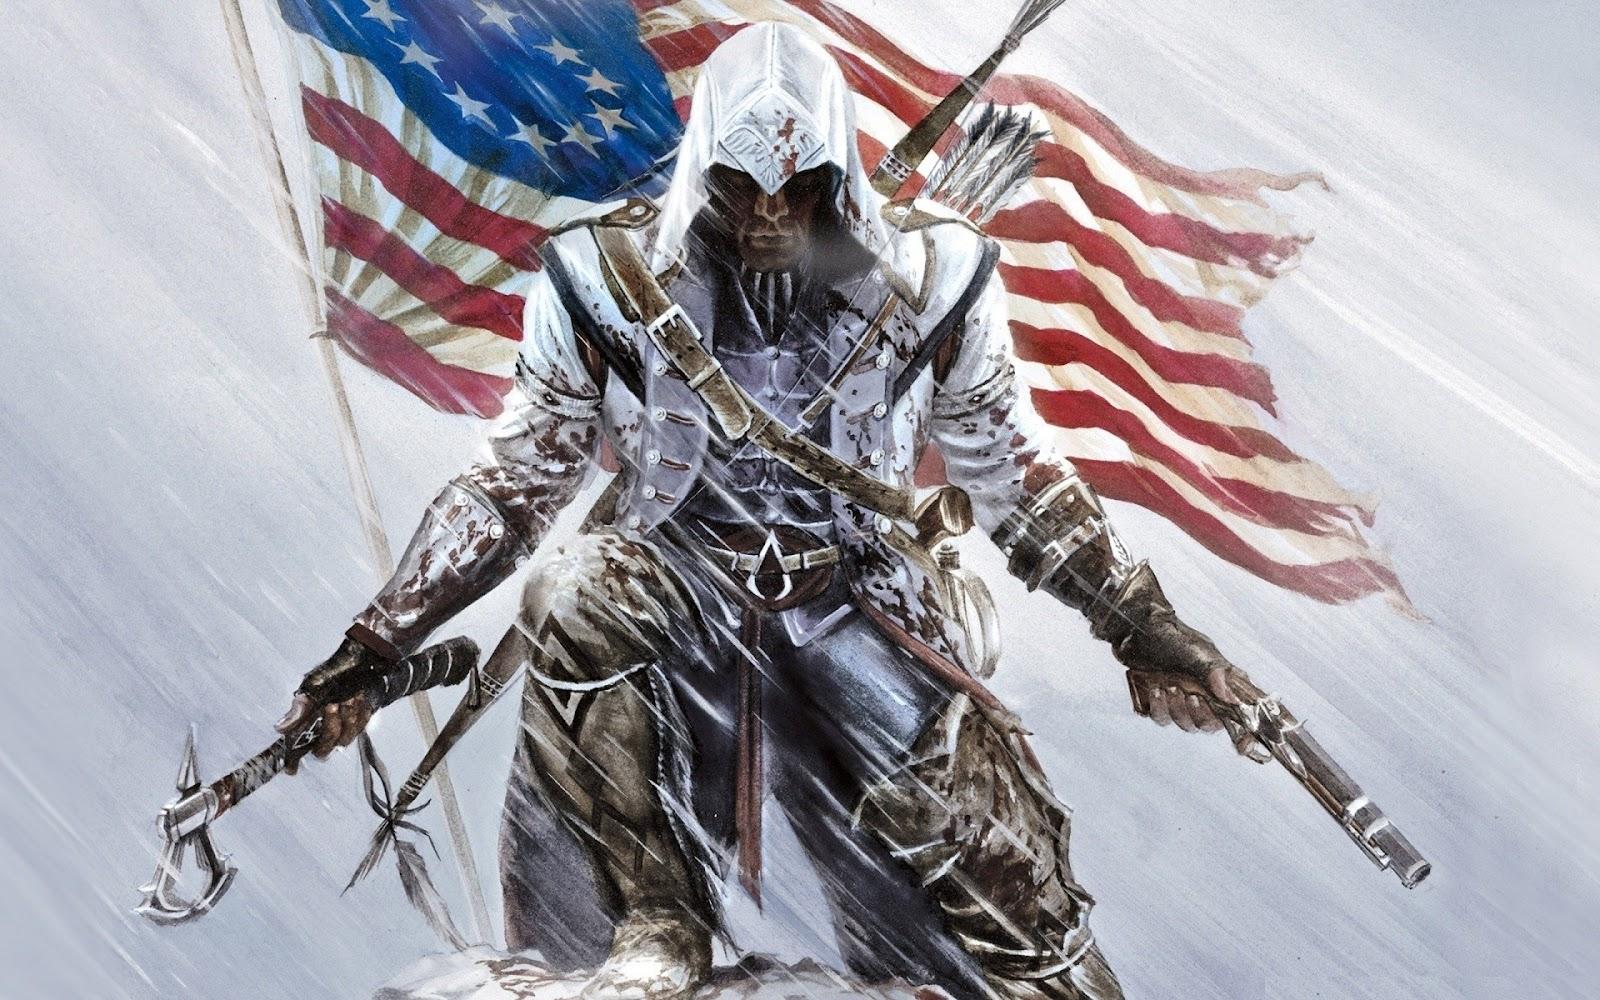 http://2.bp.blogspot.com/-xzKTNVsiy5Y/T75Qozr7S2I/AAAAAAAABak/qJUaJgDlzvA/s1600/assassins-creed-american-flag-1920x1200-wallpaper-9073.jpg